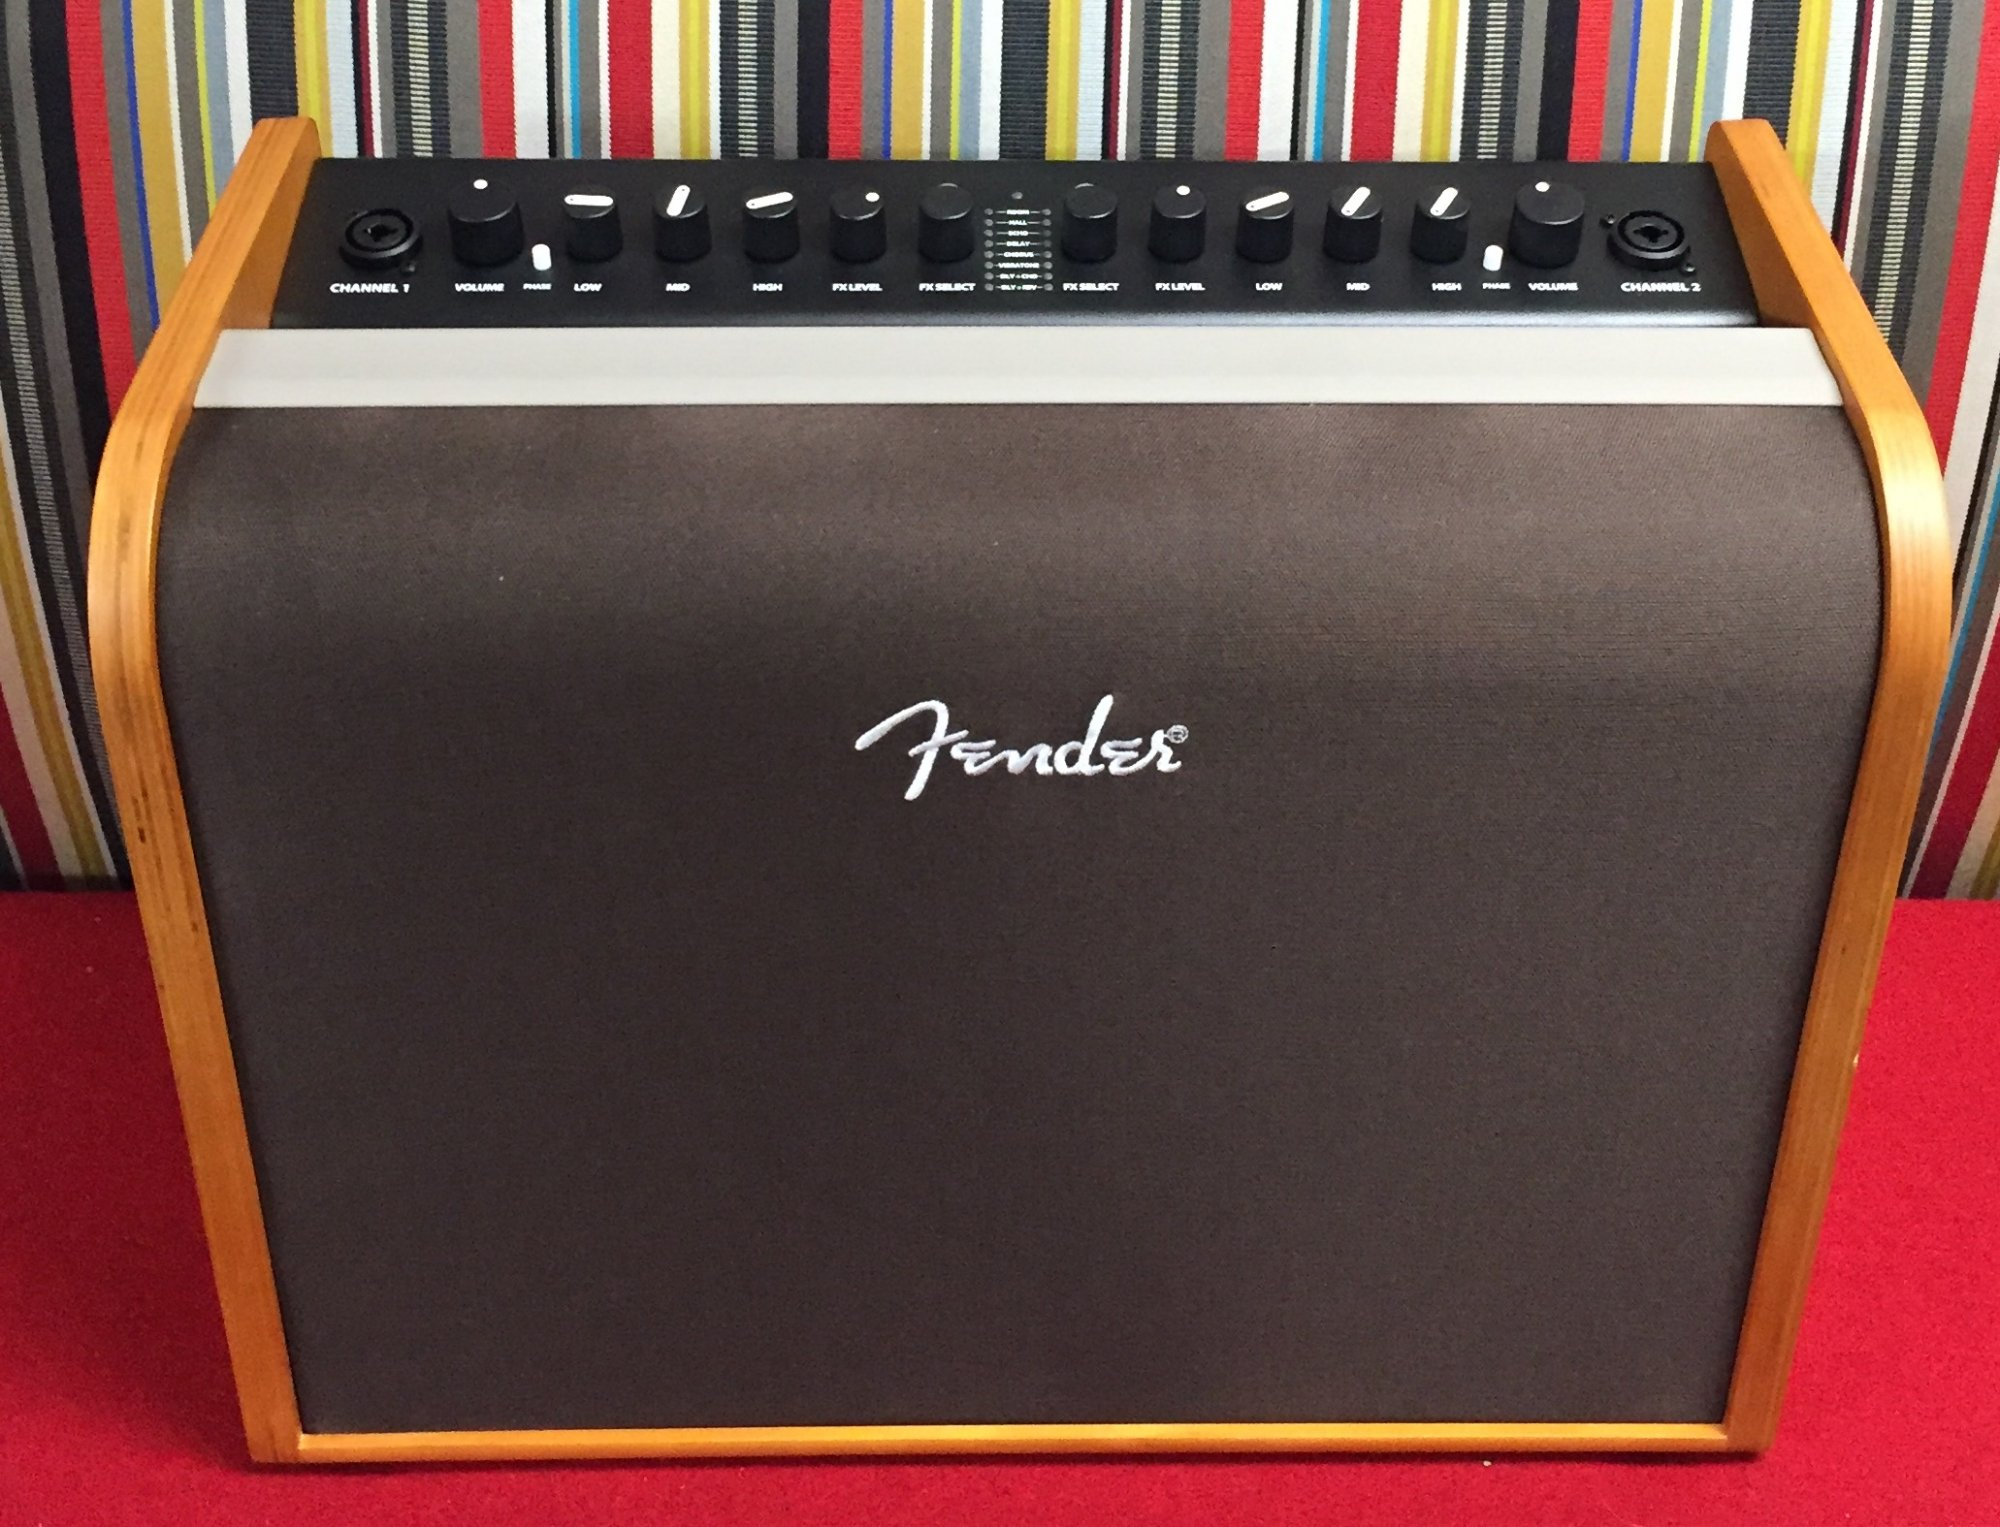 DEMO Fender Acoustic 100 Acoustic Guitar Amp